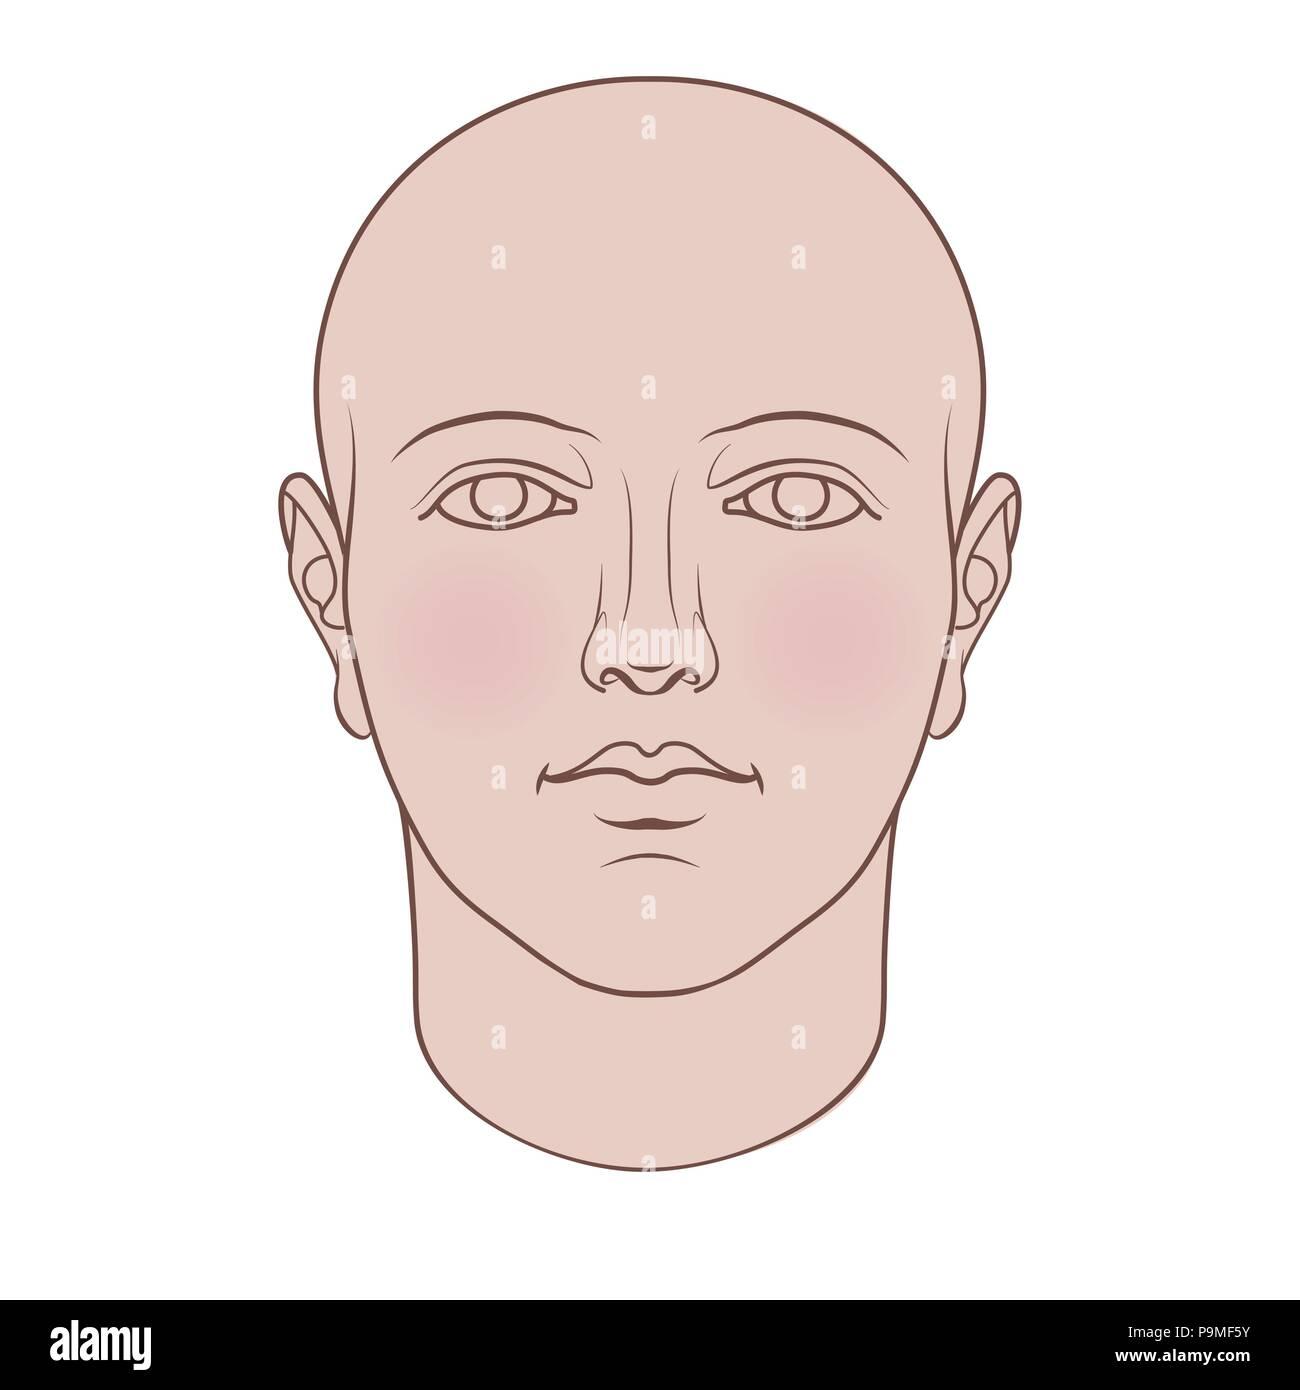 Cabeza humana dibujados a mano en la cara. Vector plano aislado sobre fondo blanco. Imagen De Stock